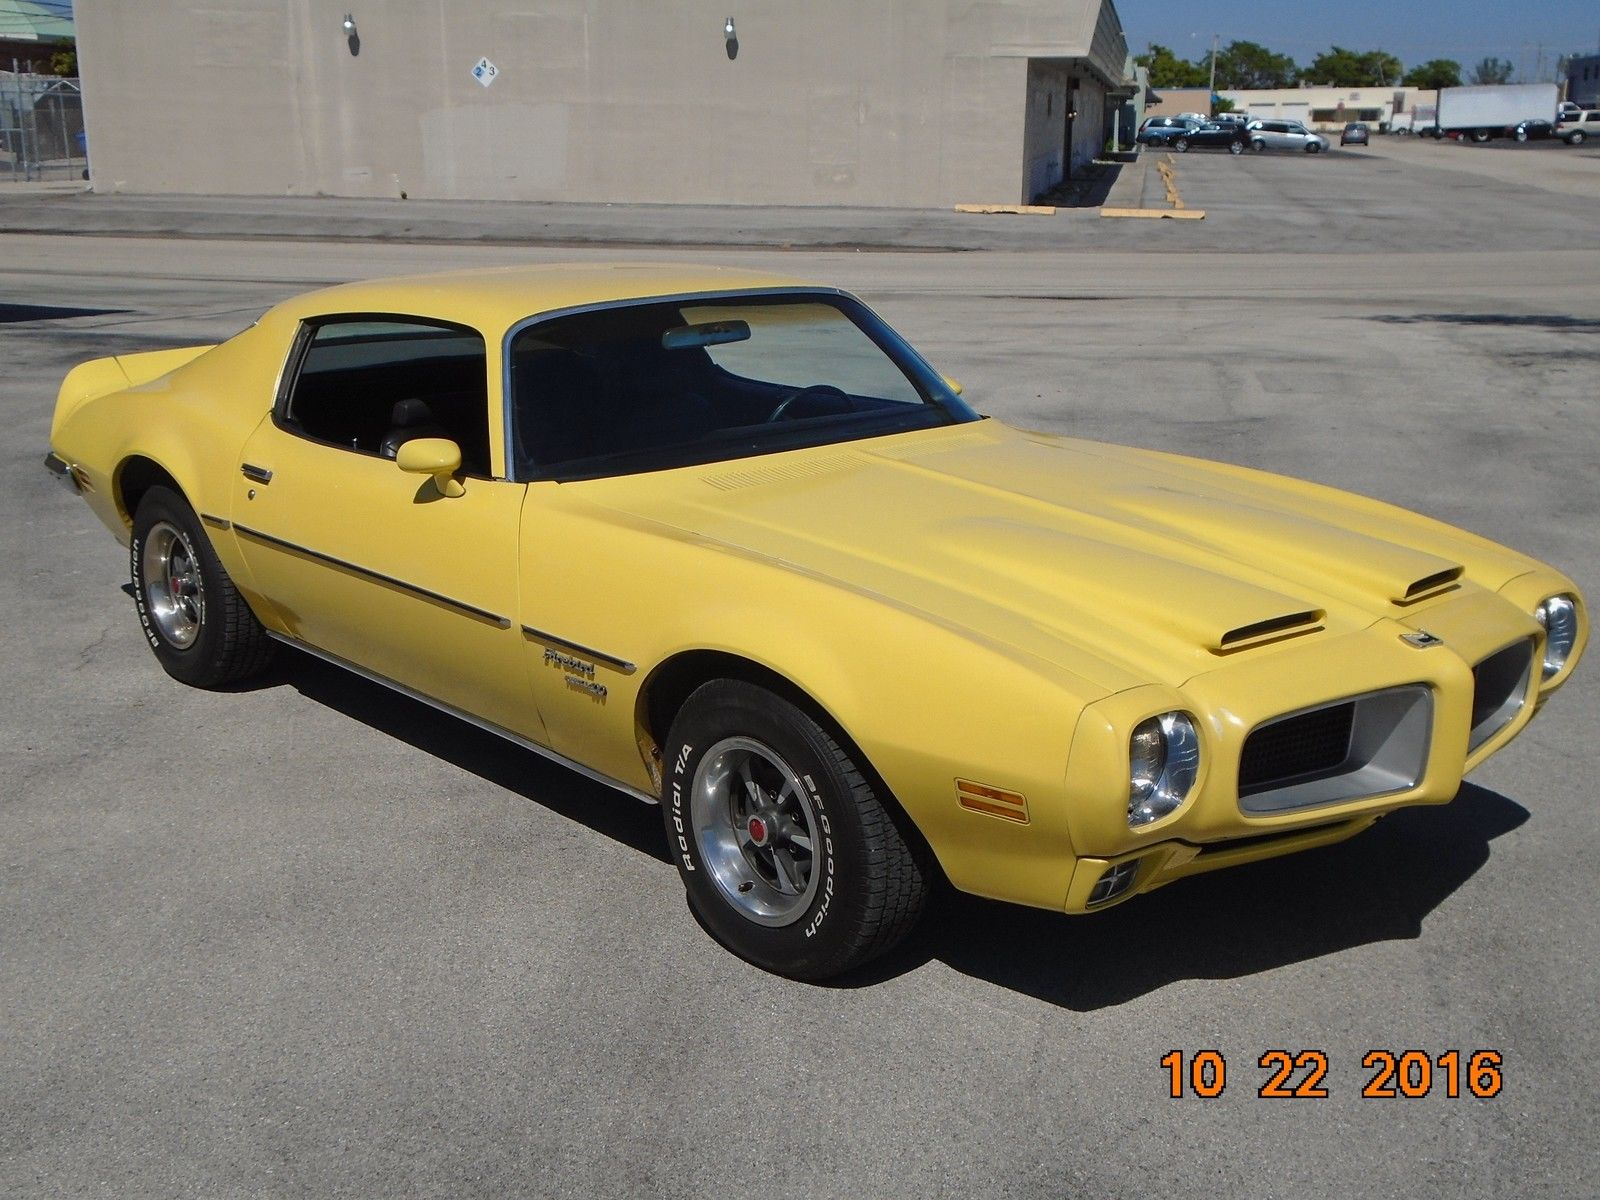 1970 pontiac firebird formula 400 project cars for sale. Black Bedroom Furniture Sets. Home Design Ideas